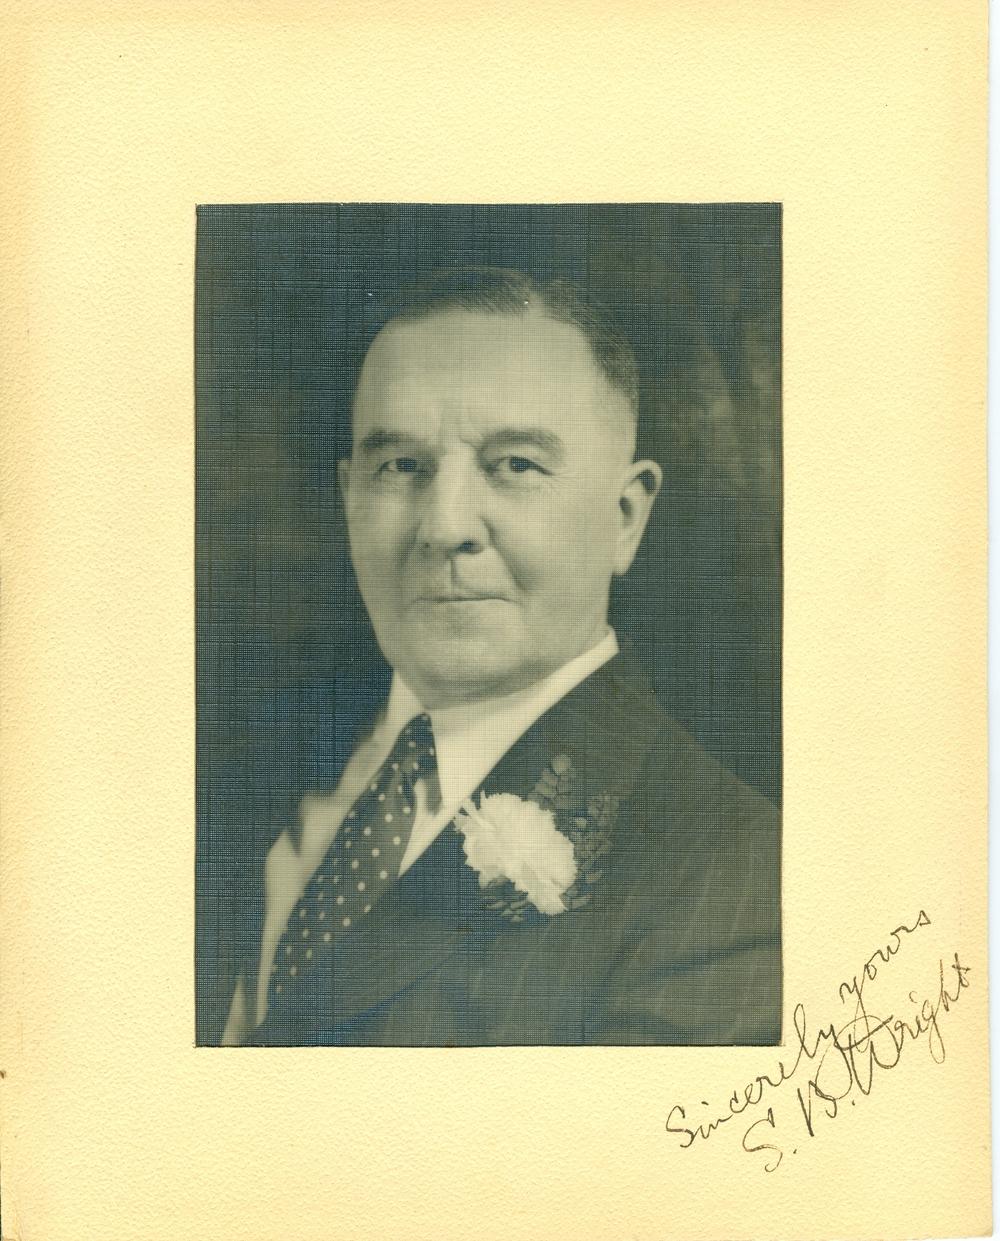 S.B. Wright